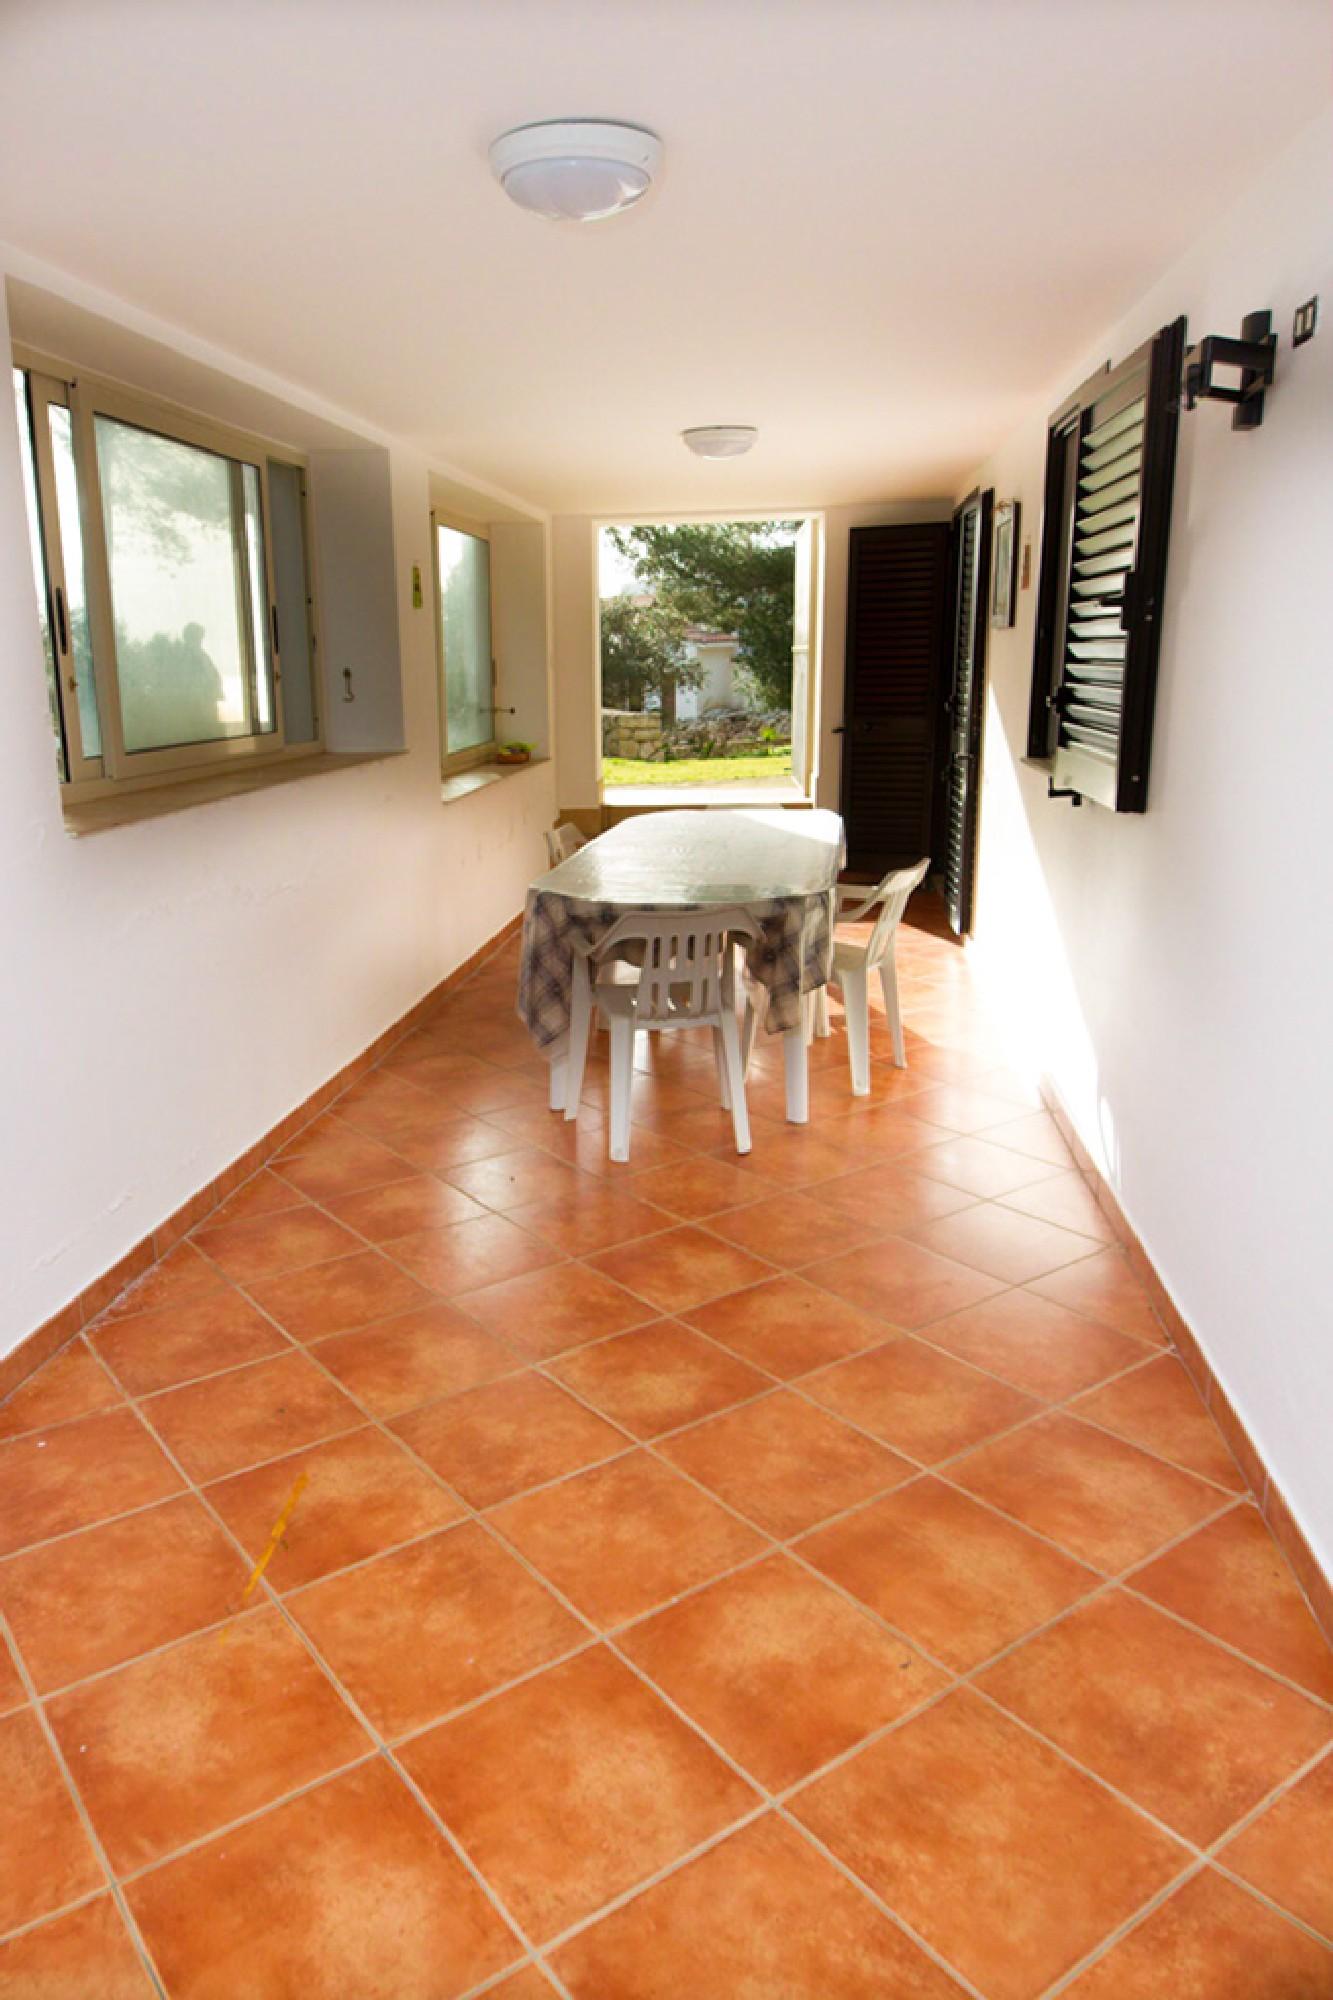 Apartment Apt Porticato 2 - Cantoru photo 24289673